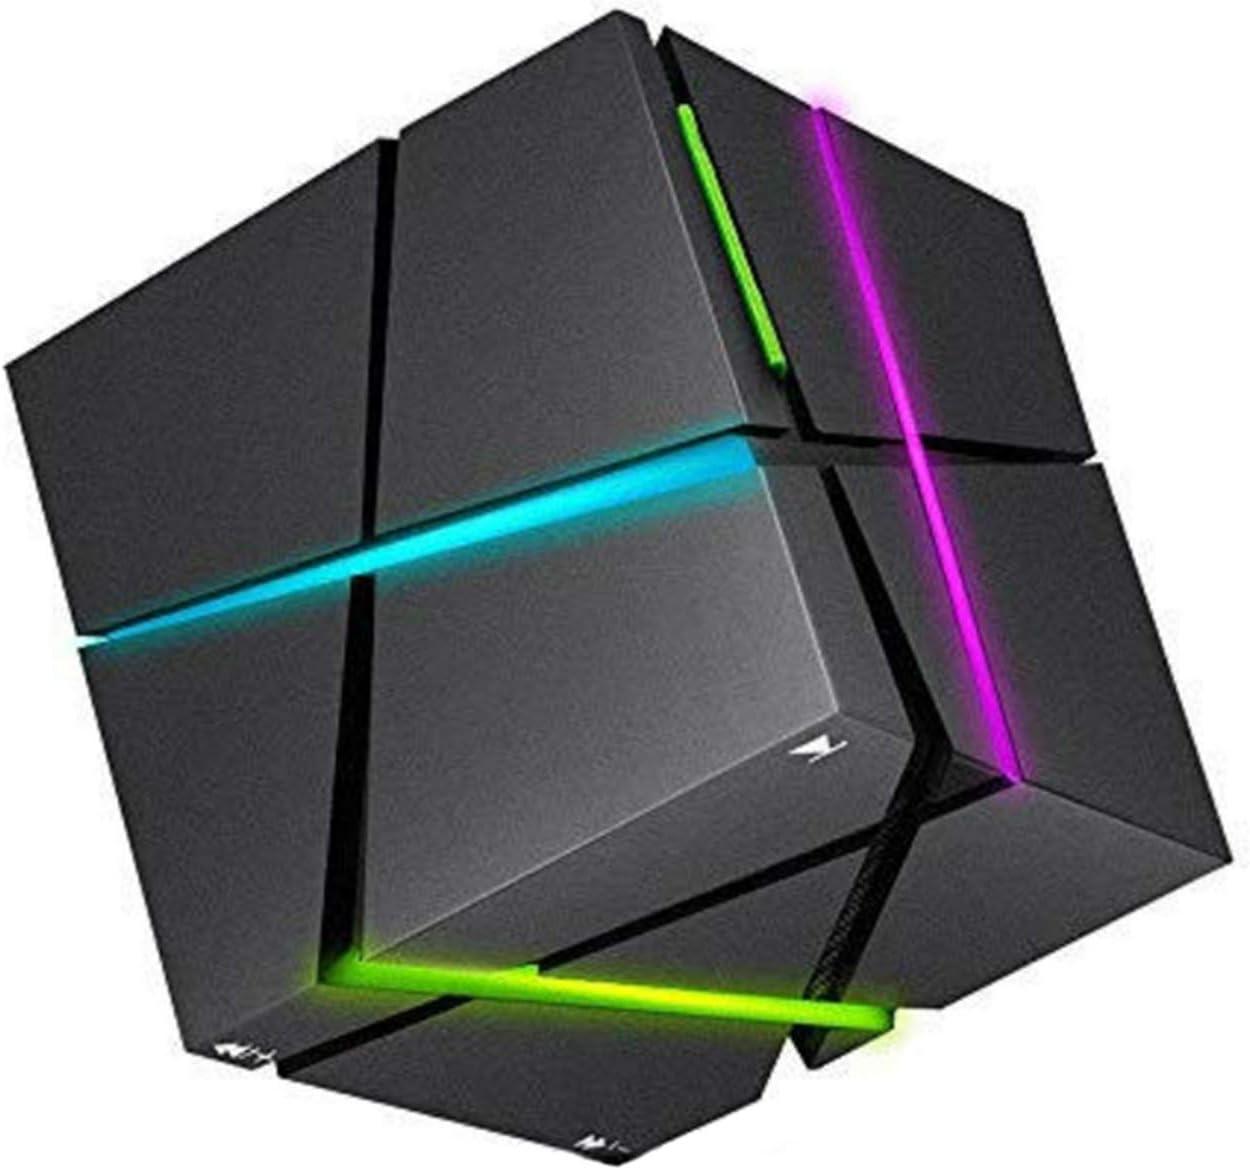 Lámpara De Mesa con Luz Nocturna LED RGB, Mini Subwoofer Portátil Rubik'S Cube con Altavoz Bluetooth HiFi, Altavoz Bluetooth Multifuncional para Lámpara Nocturna,Negro